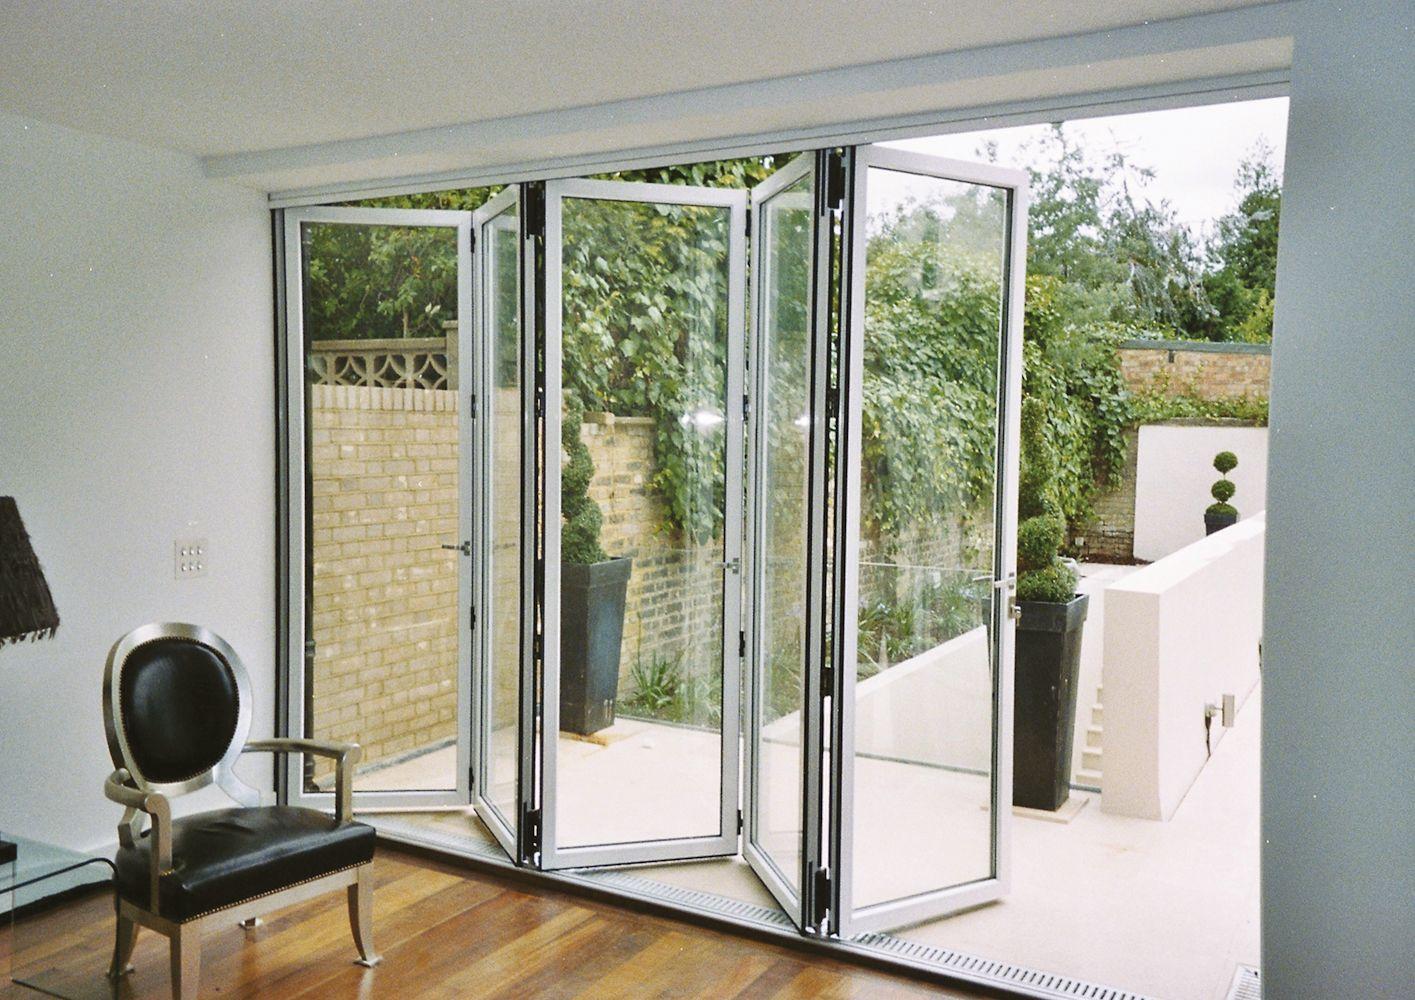 Aluminium And Timber Bifolding Doors 45 3 Jpg 1 415 1 000 Pixels Folding Patio Doors Sliding Glass Doors Patio Glass Doors Patio